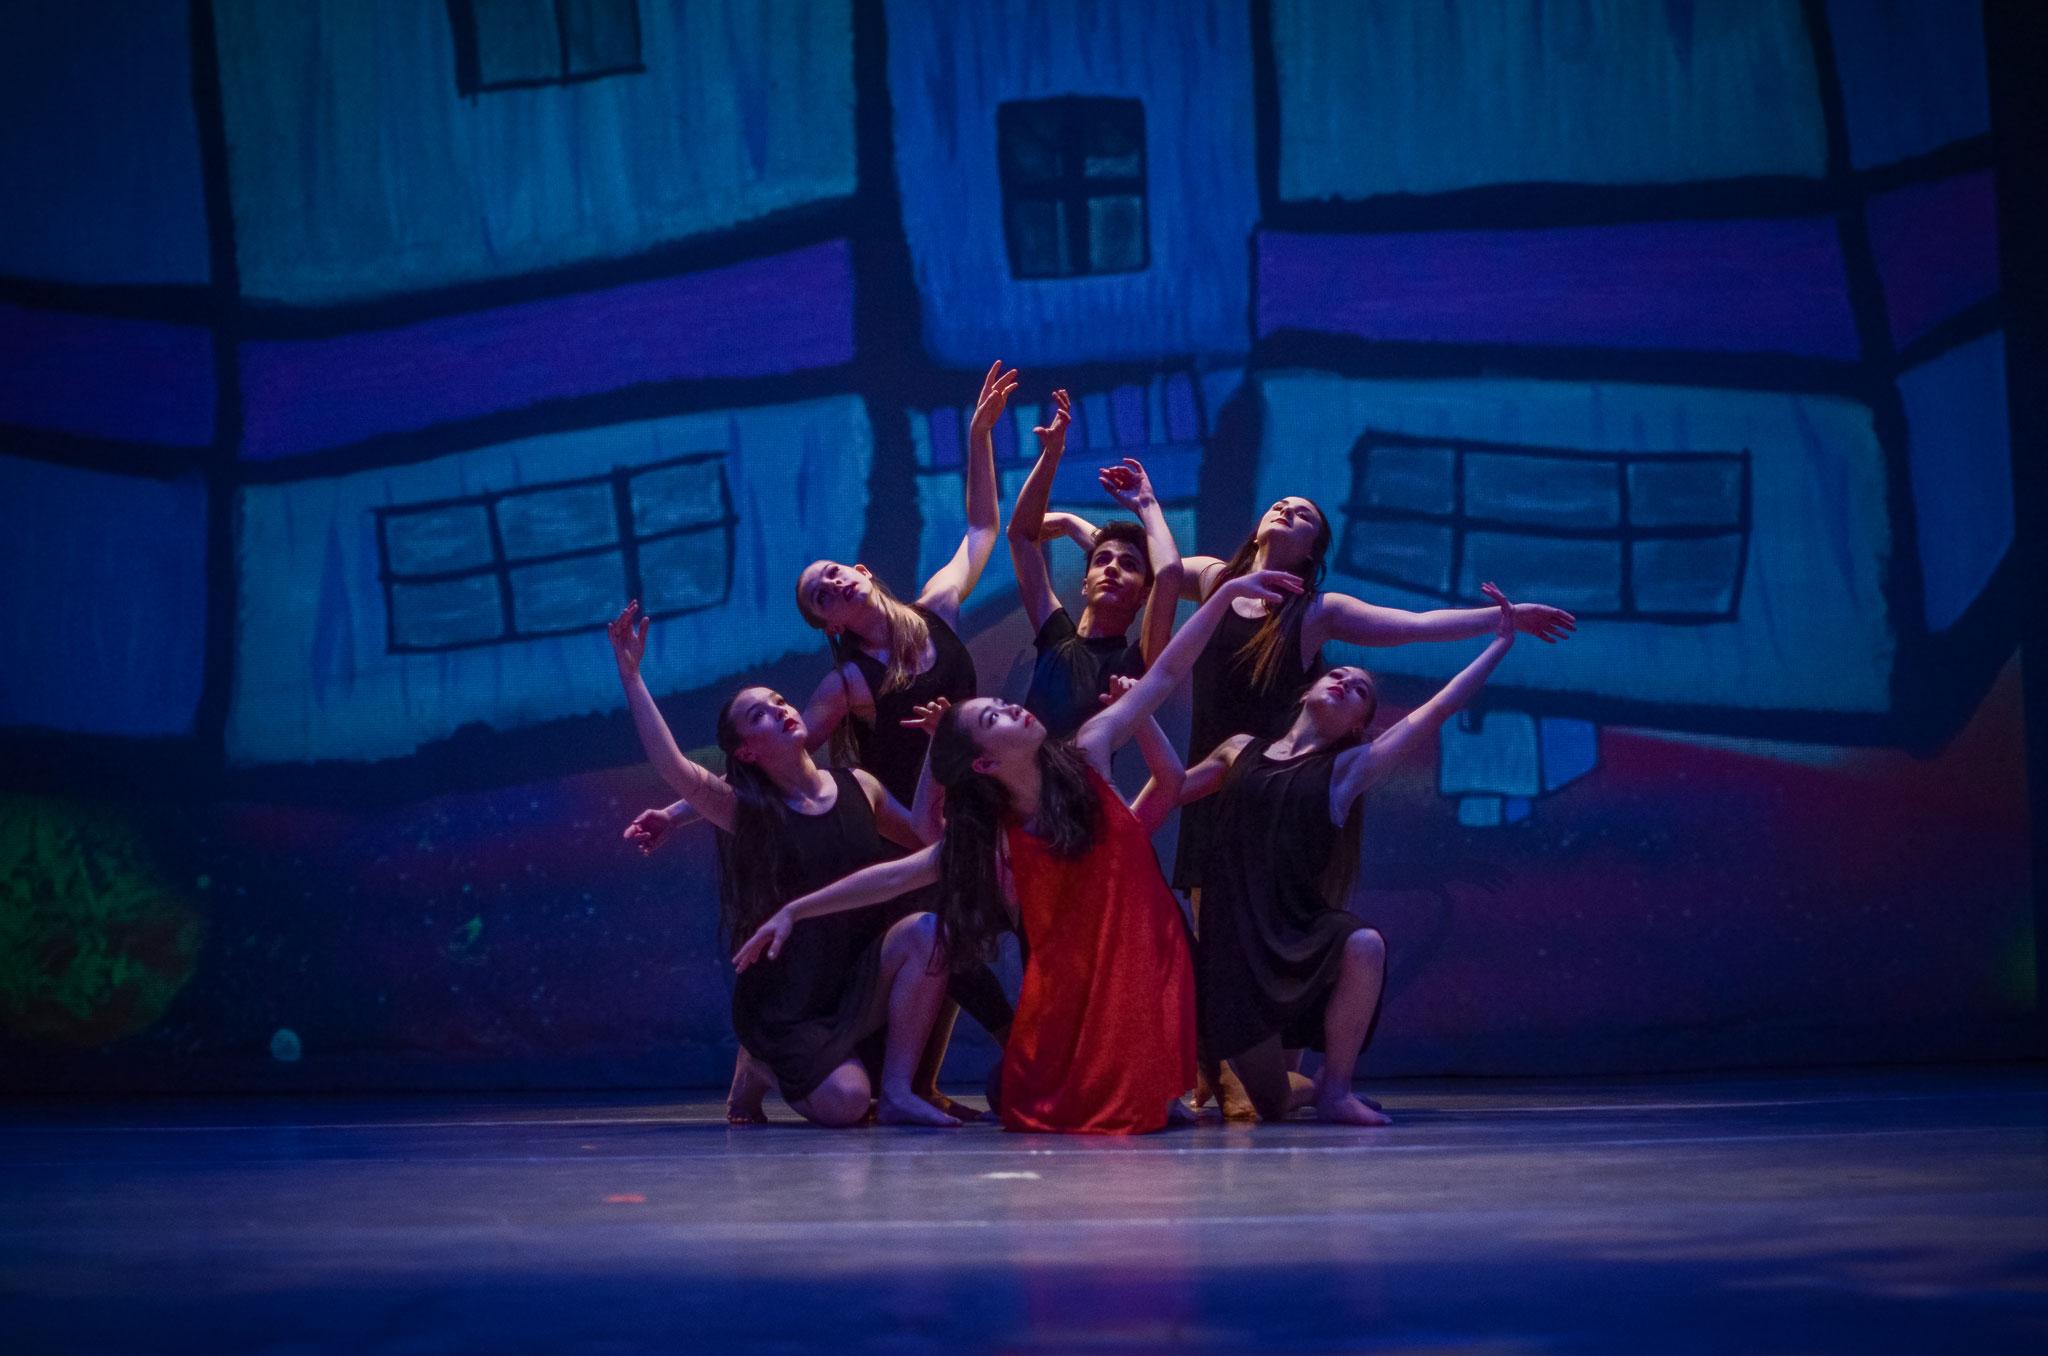 Ballet Modern Tap Northern Plains Dance Bringing The Art Of